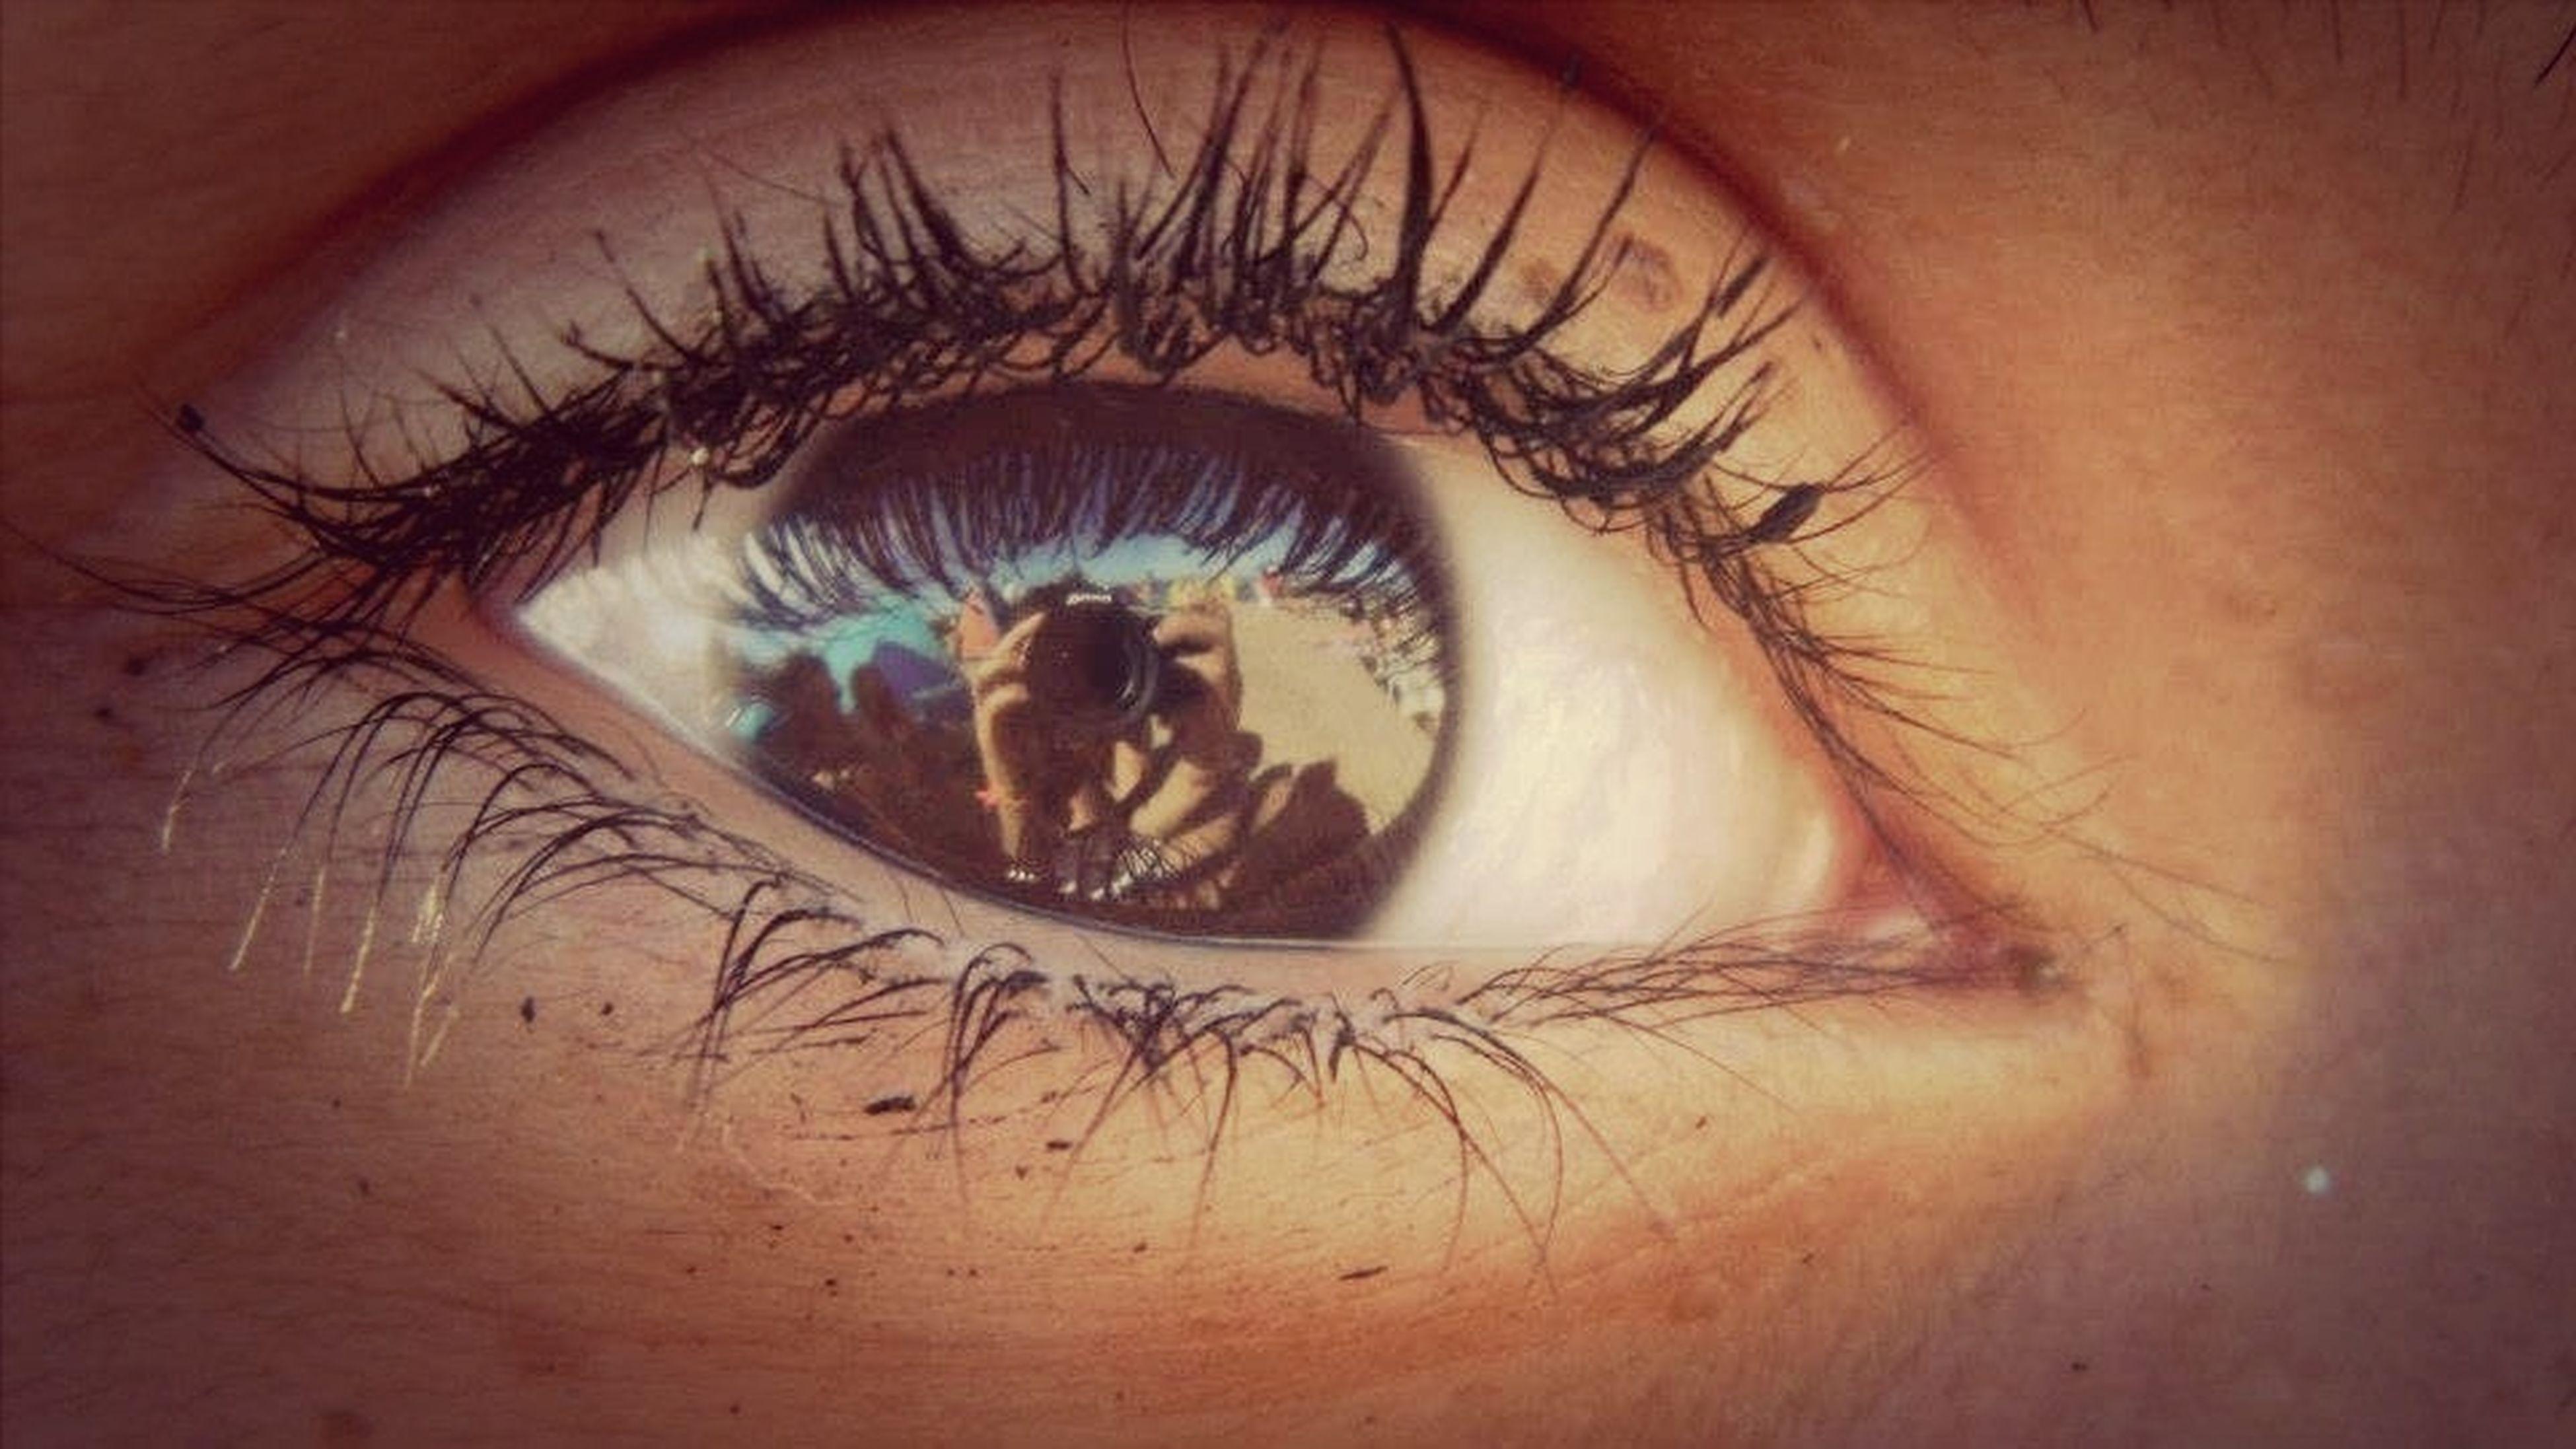 person, human eye, close-up, indoors, part of, eyelash, lifestyles, unrecognizable person, eyesight, human skin, cropped, sensory perception, leisure activity, circle, holding, human finger